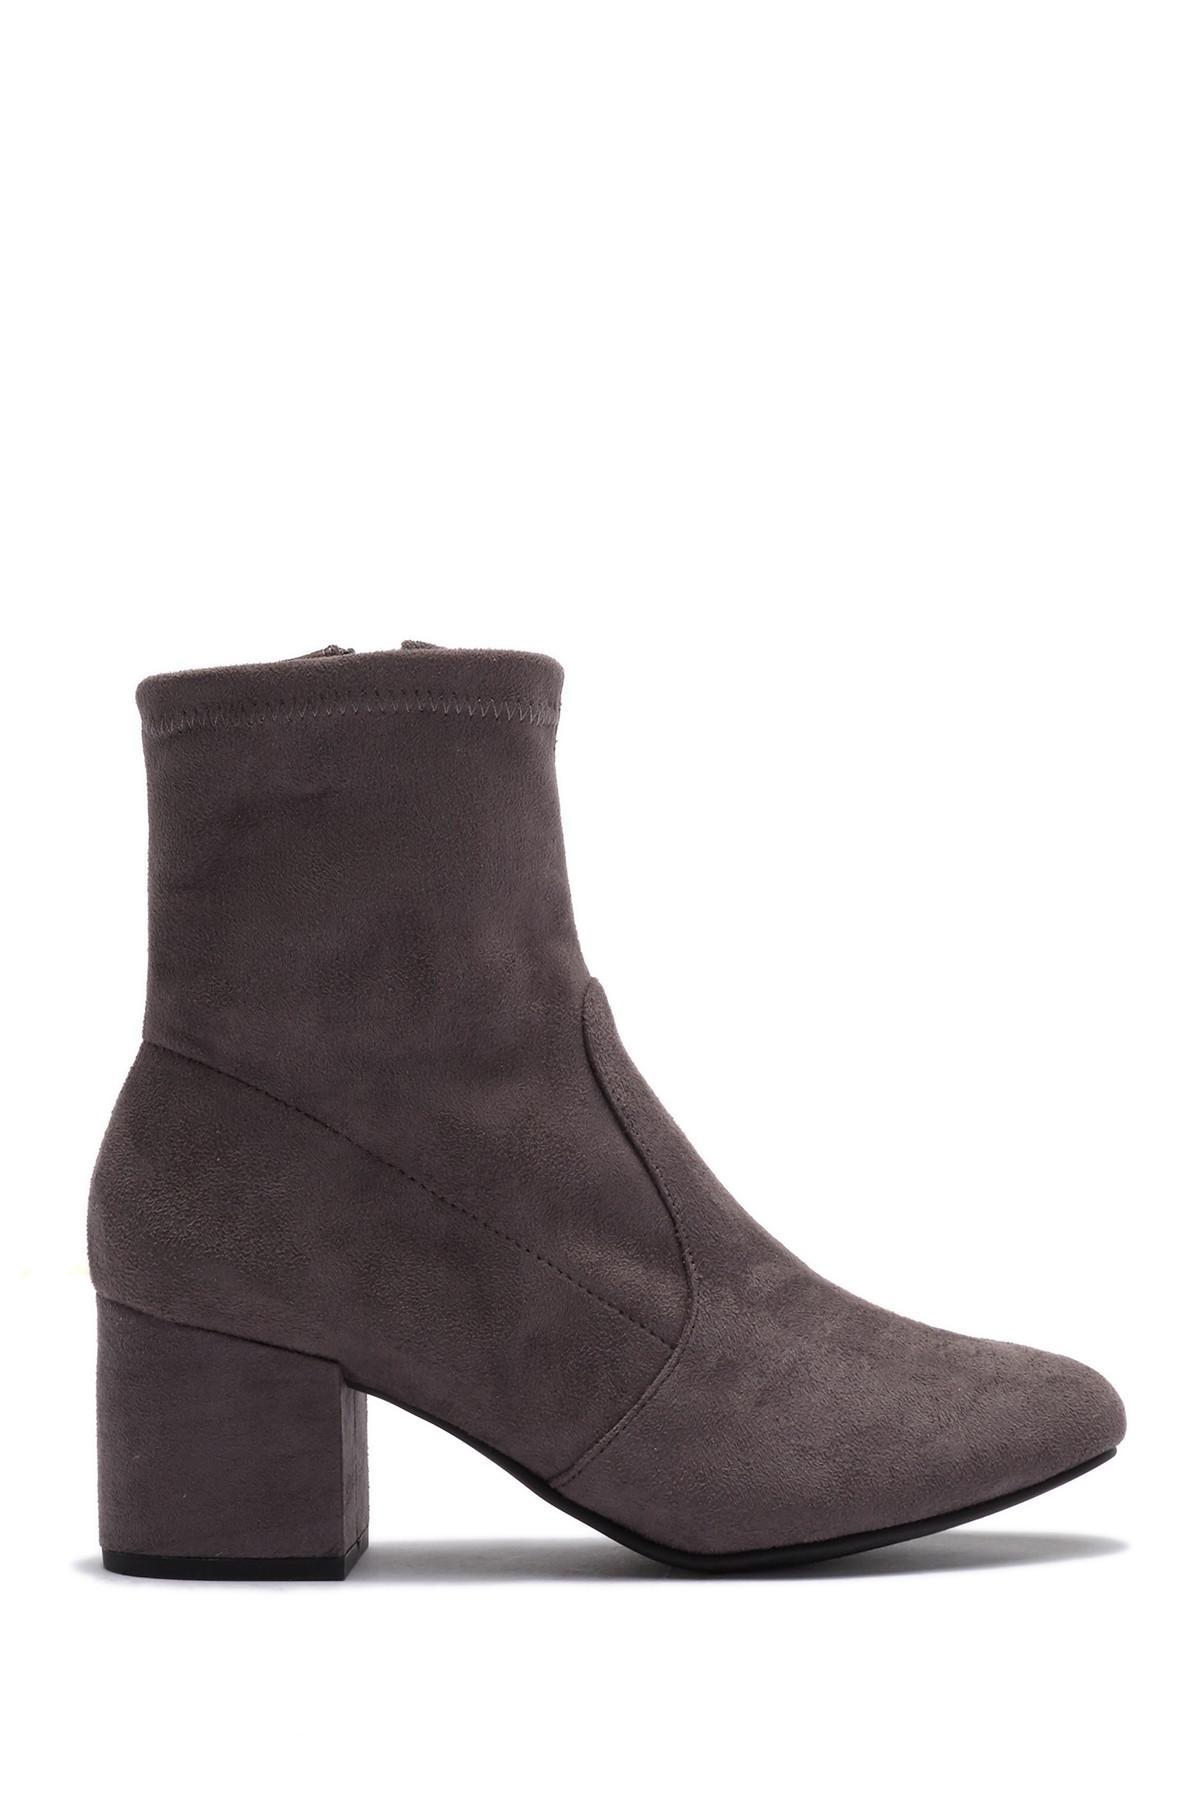 0d9e239eaaa Lyst - Steve Madden Immense Block Heel Boot in Gray